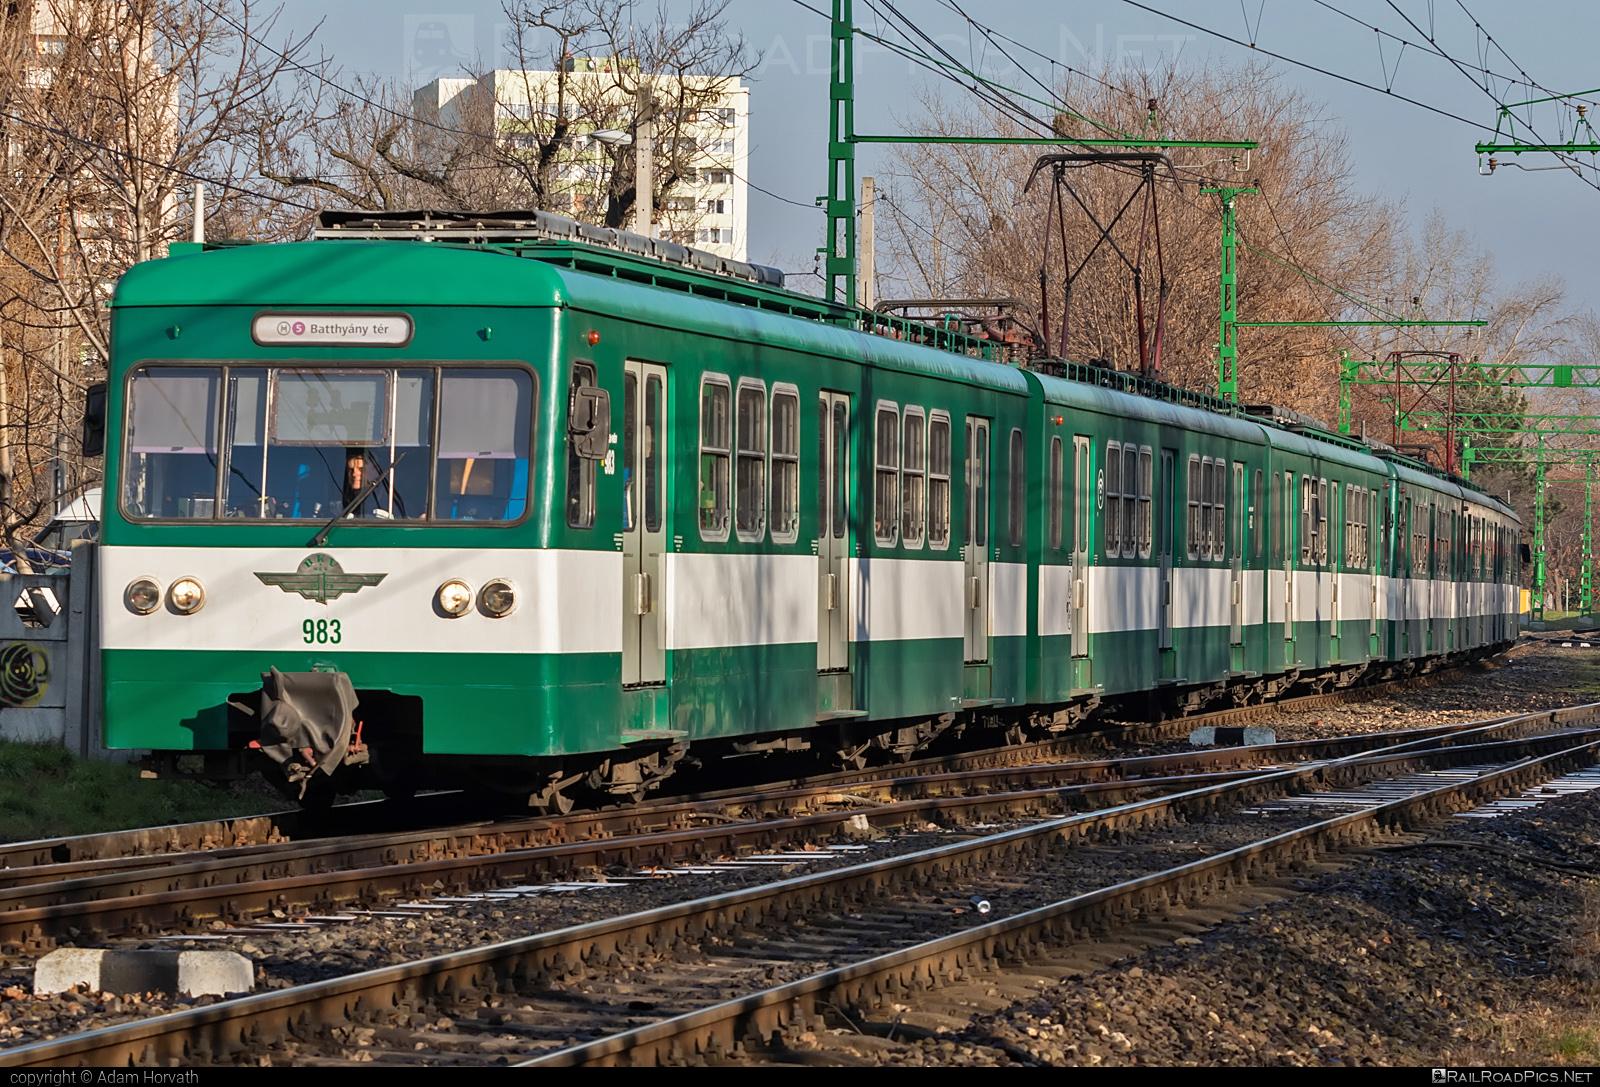 LEW Hennigsdorf MXa - 983 operated by Budapesti Helyi Érdekü Vasút #BudapestiHelyiErdekuVasut #bhev #hansbeimler #lewhennigsdorf #lewmxa